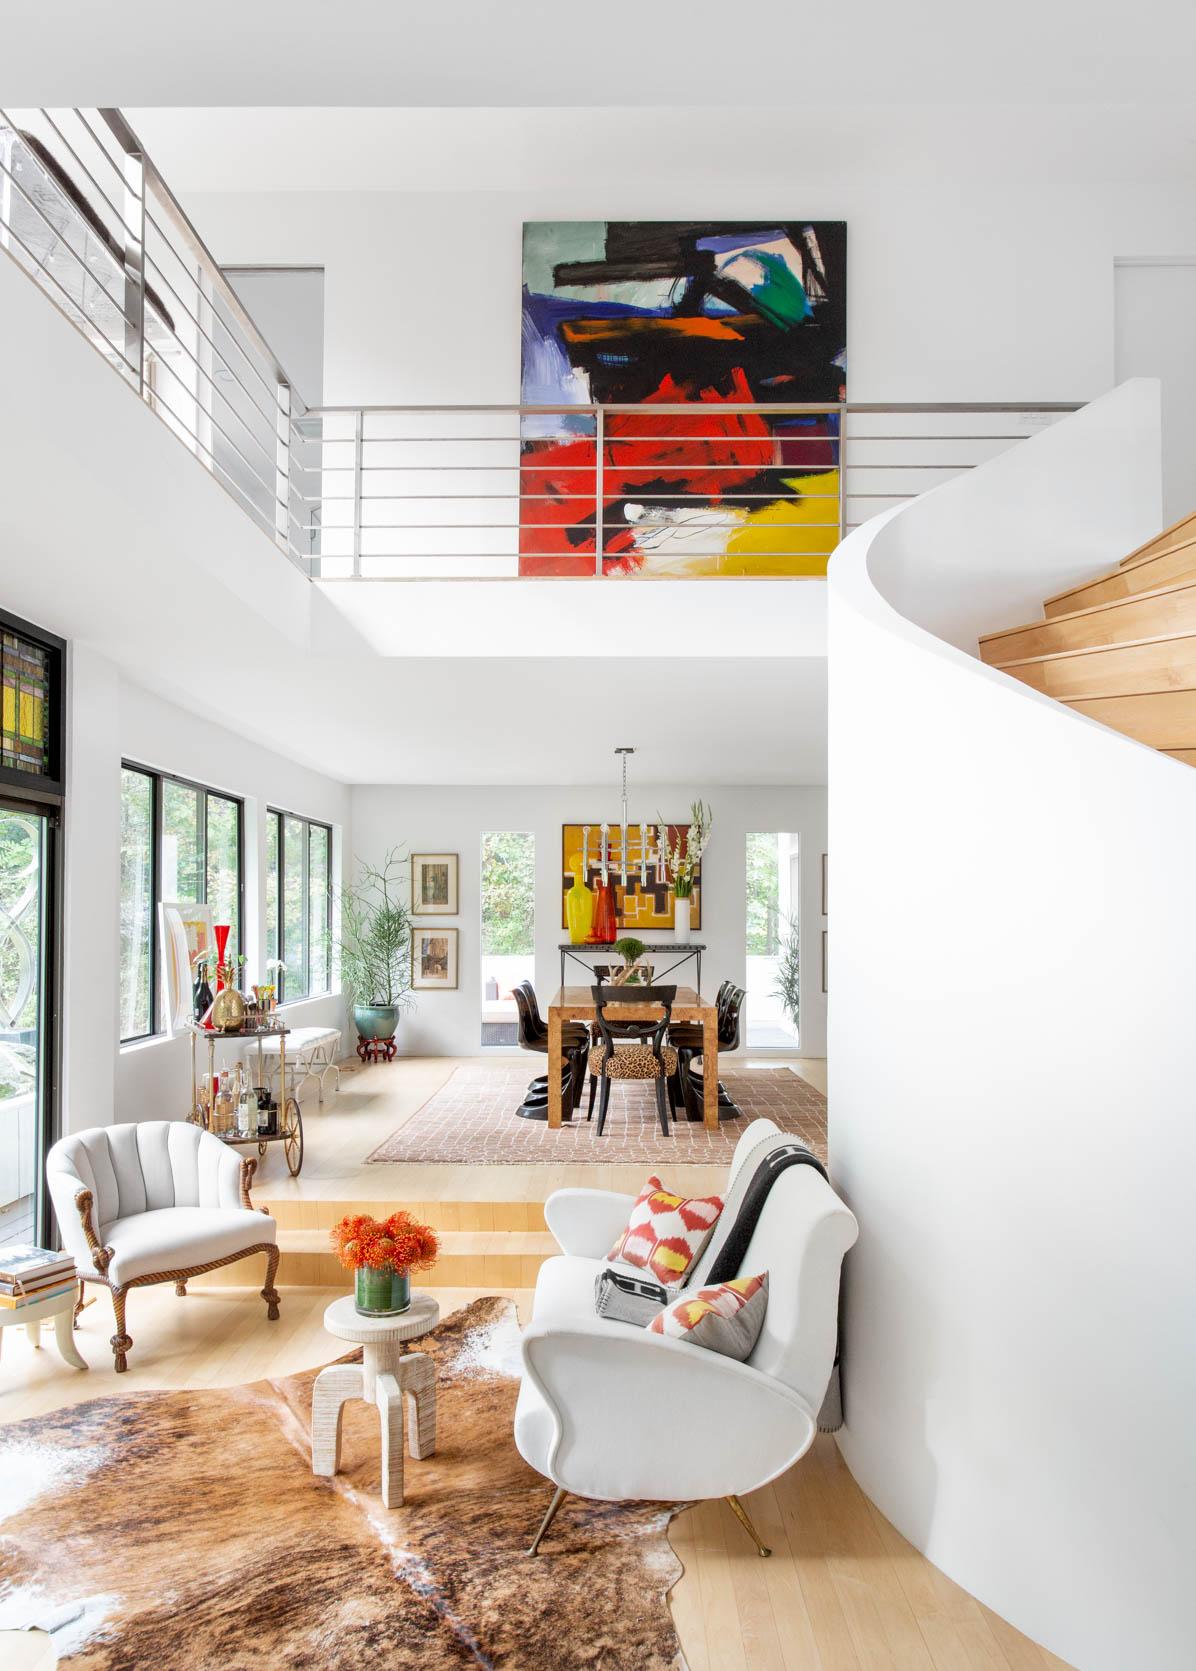 greenwich-connecticut-eclectic-interior-design-6.jpg